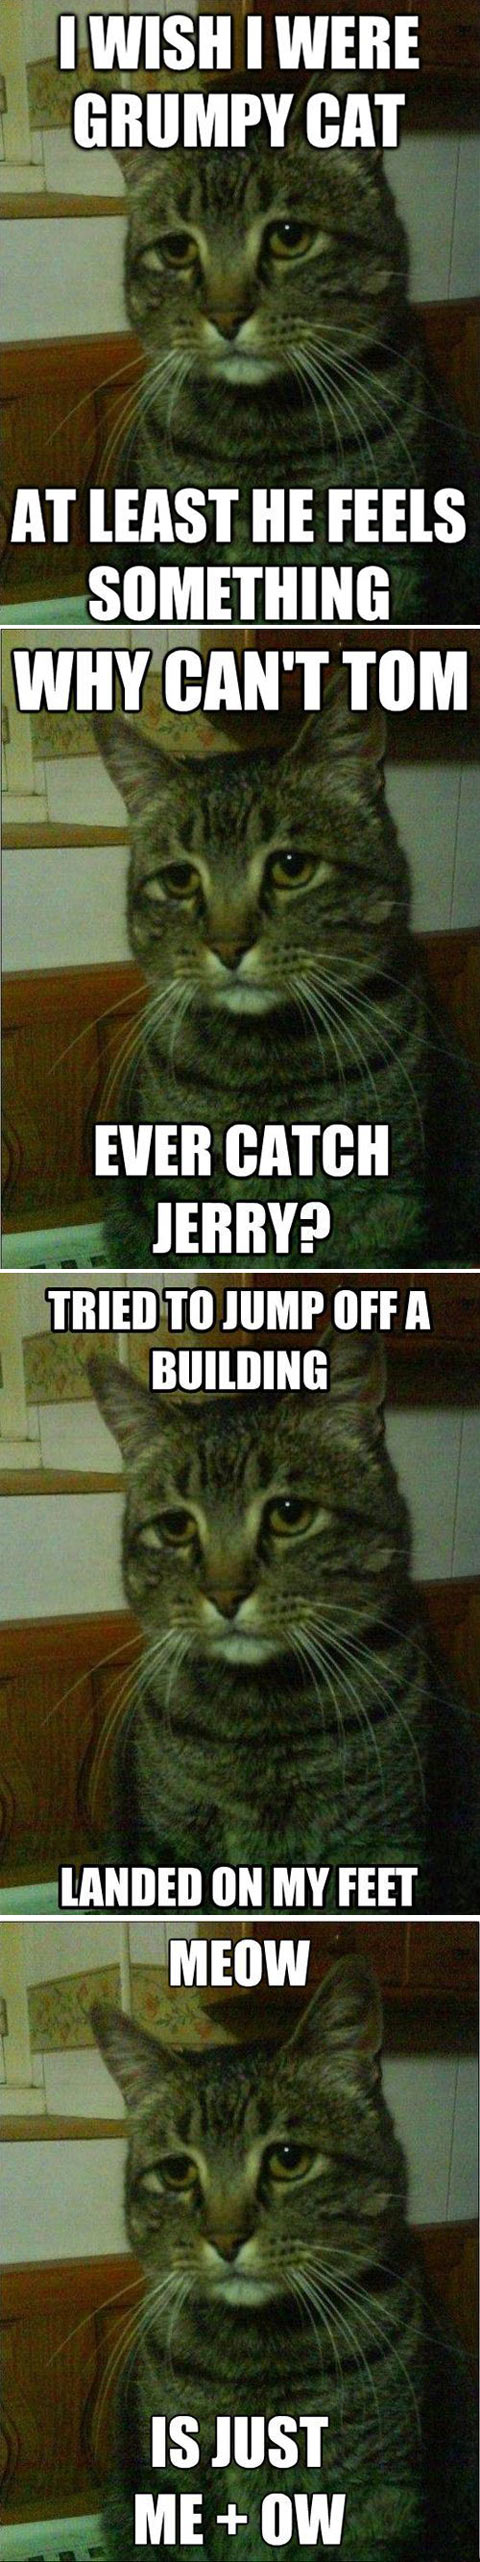 funny-sad-cat-wishes-Grumpy